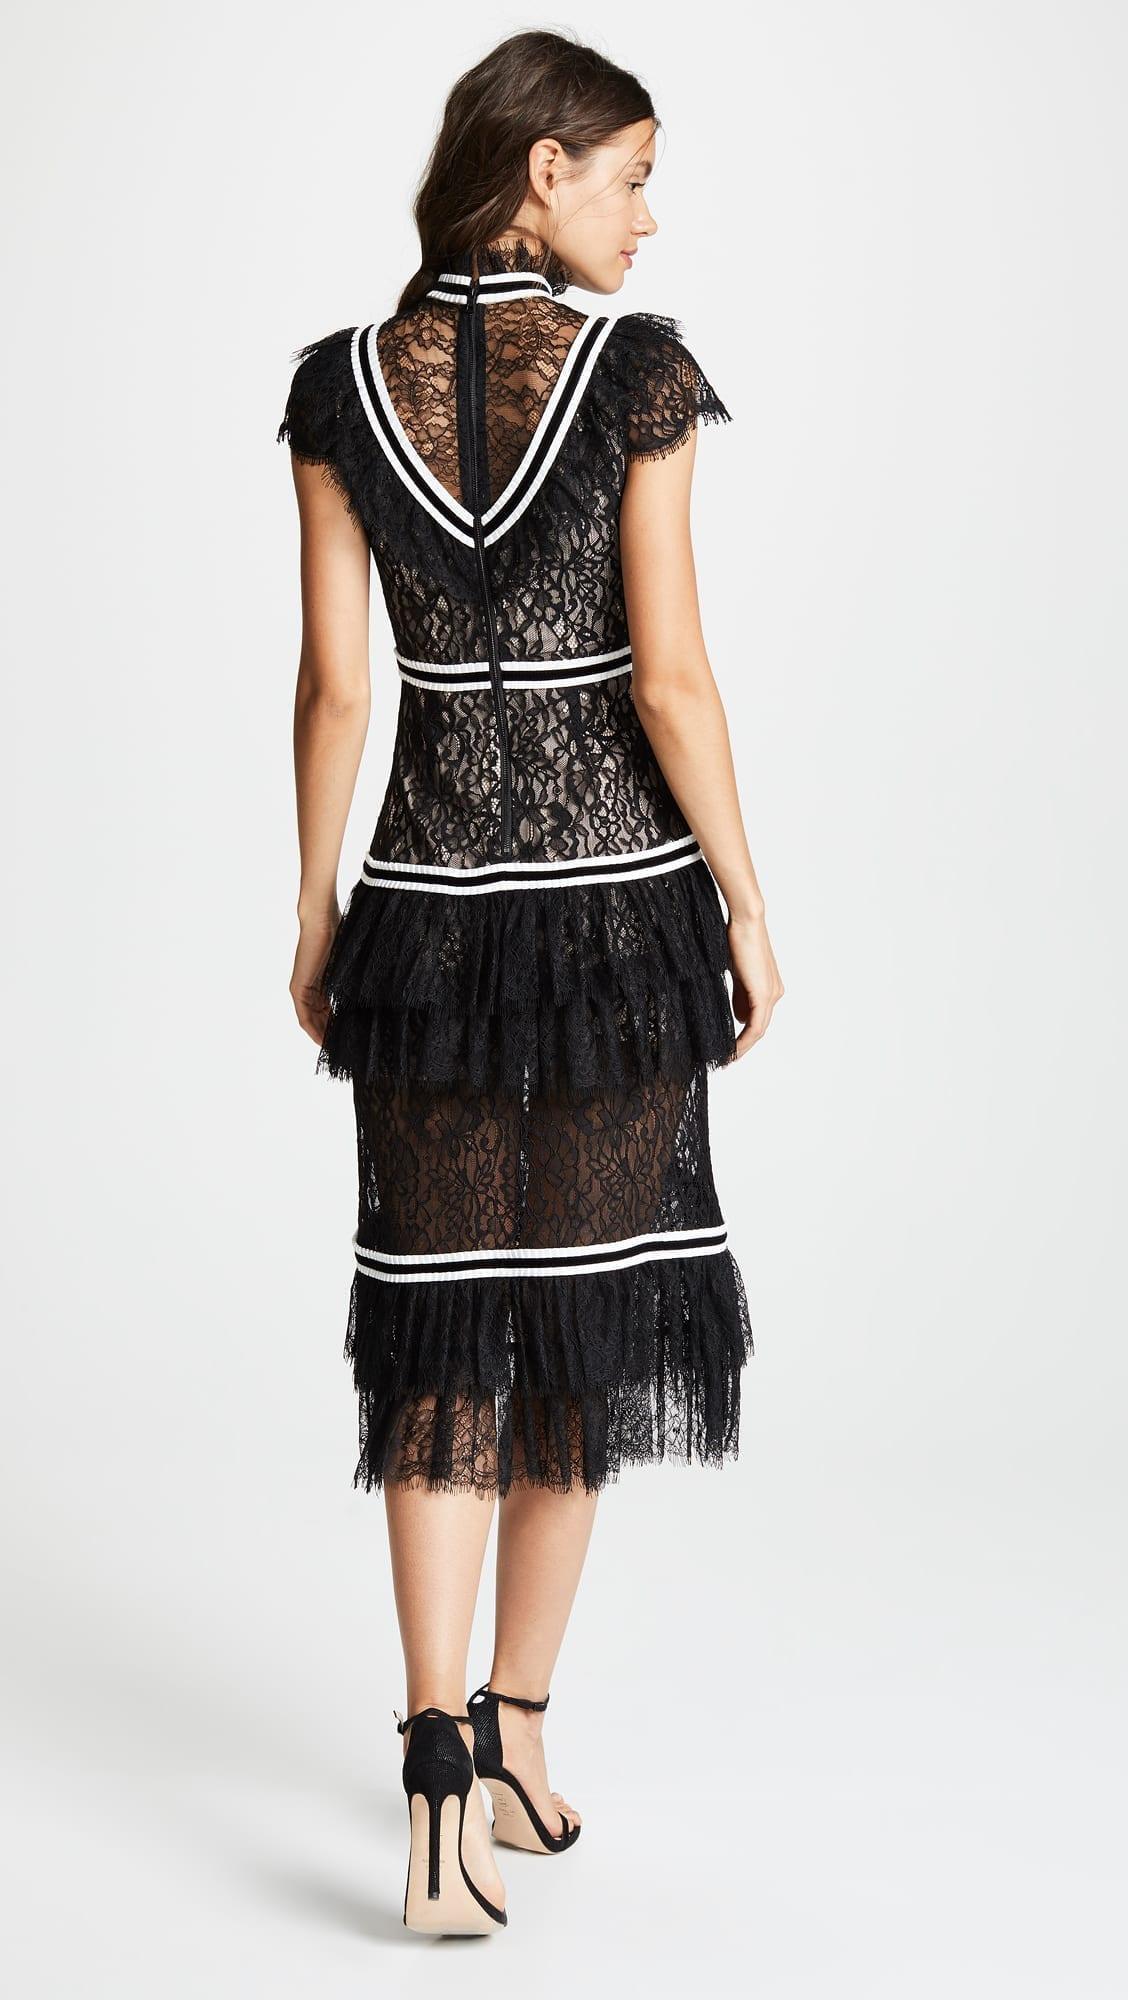 Alice Olivia Annetta Ruffle Black Off White Dress